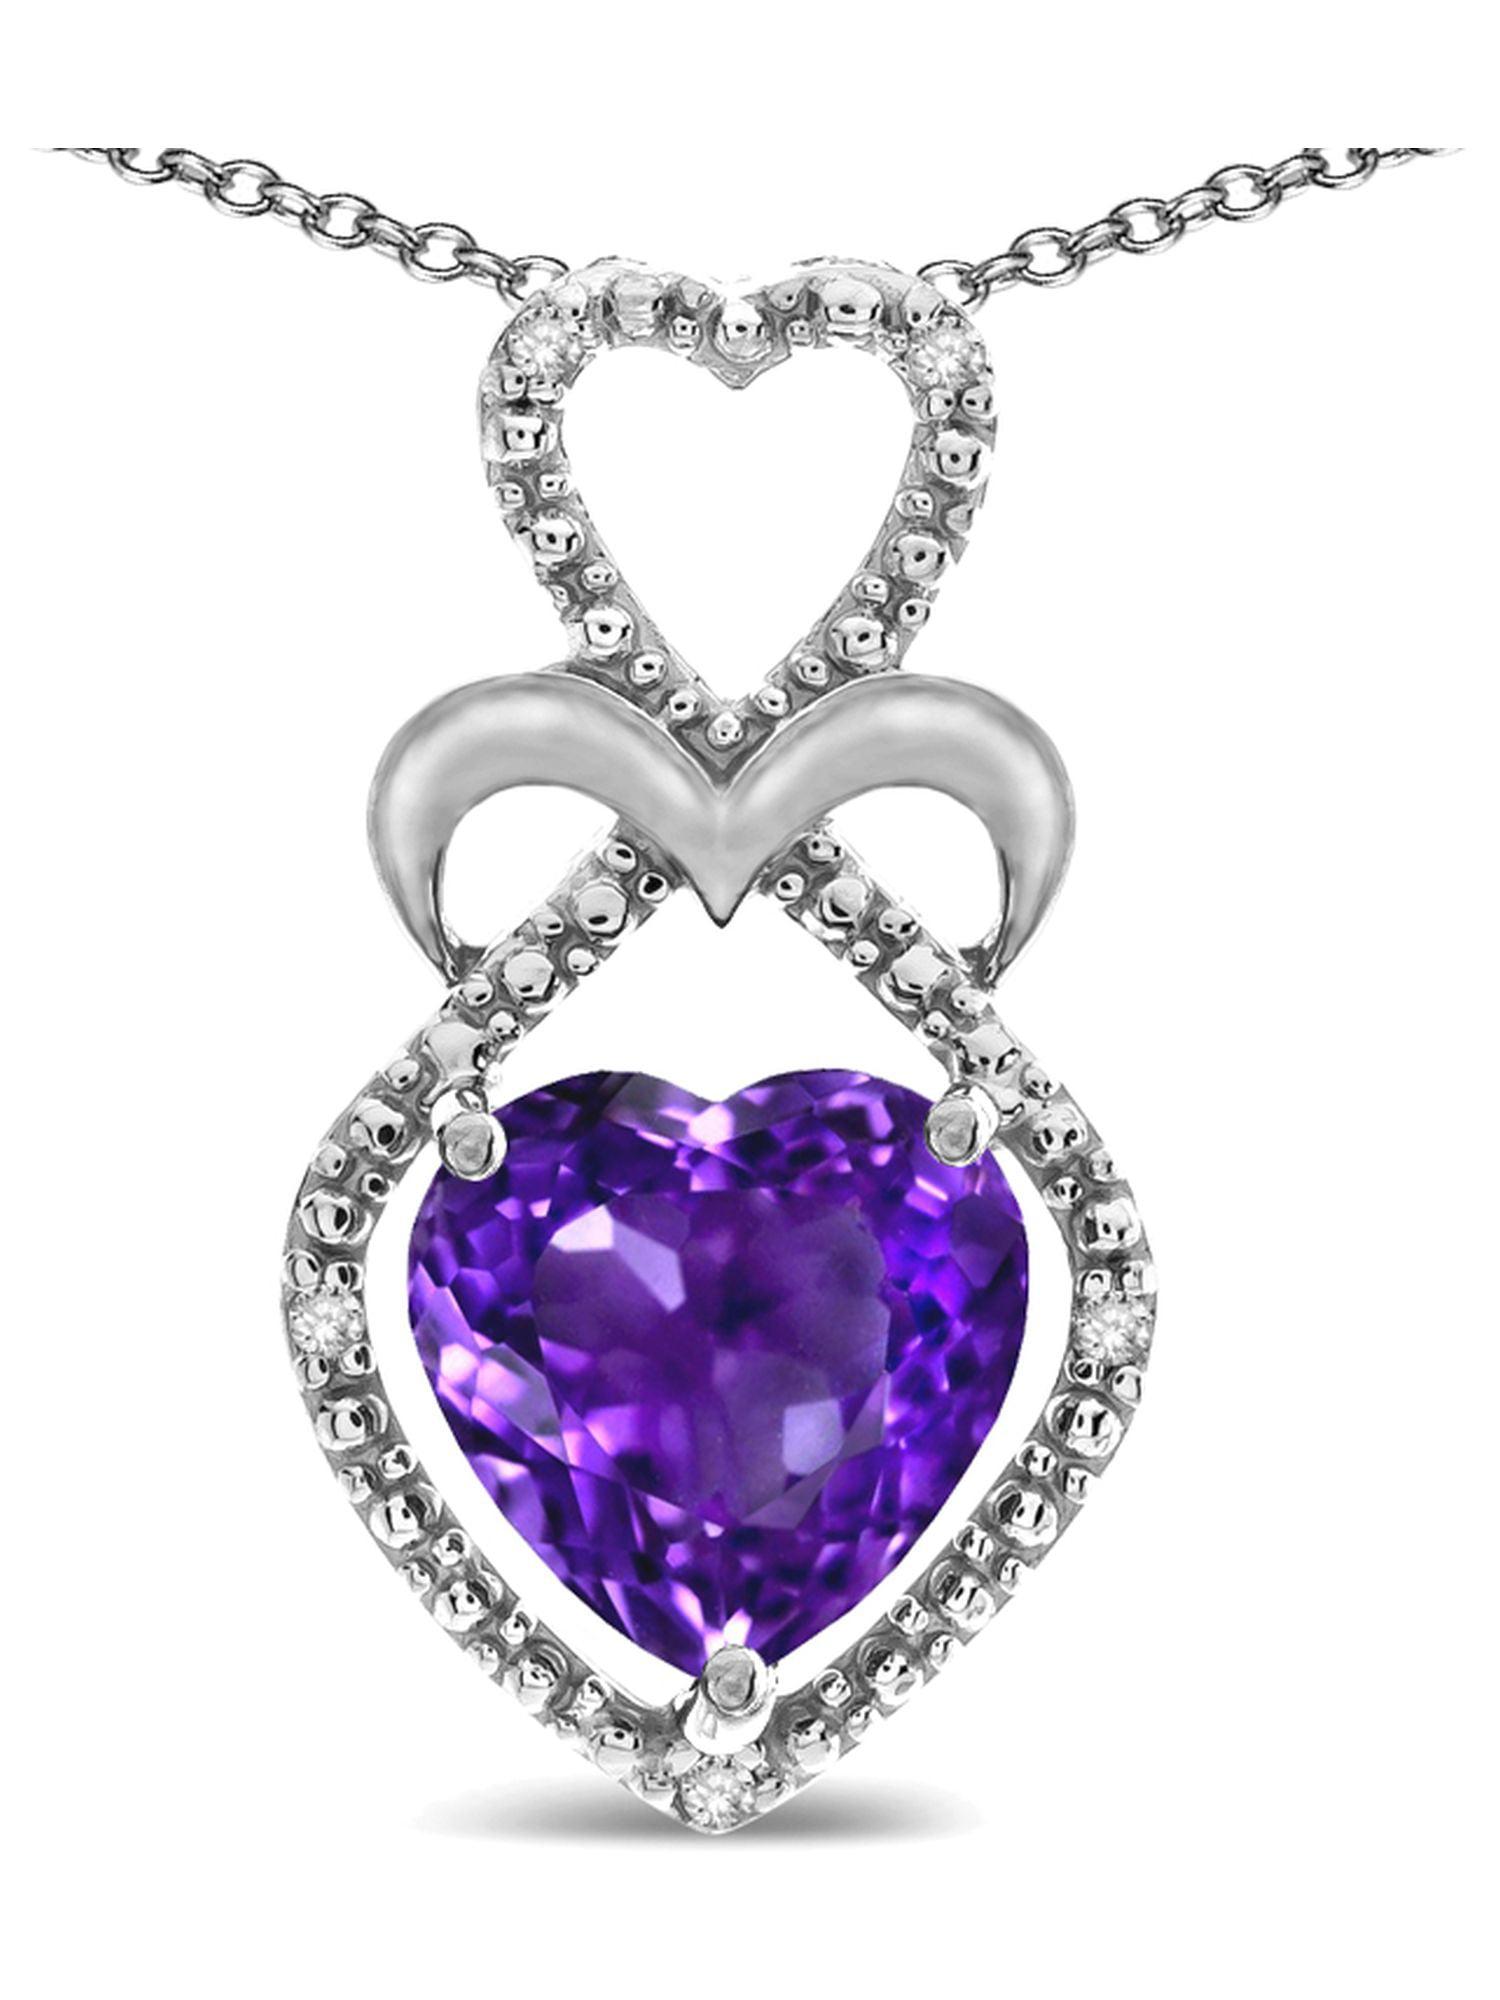 Star K Heart Shape 8mm Amethyst Double Heart Halo Embrace Pendant Necklace by Star K